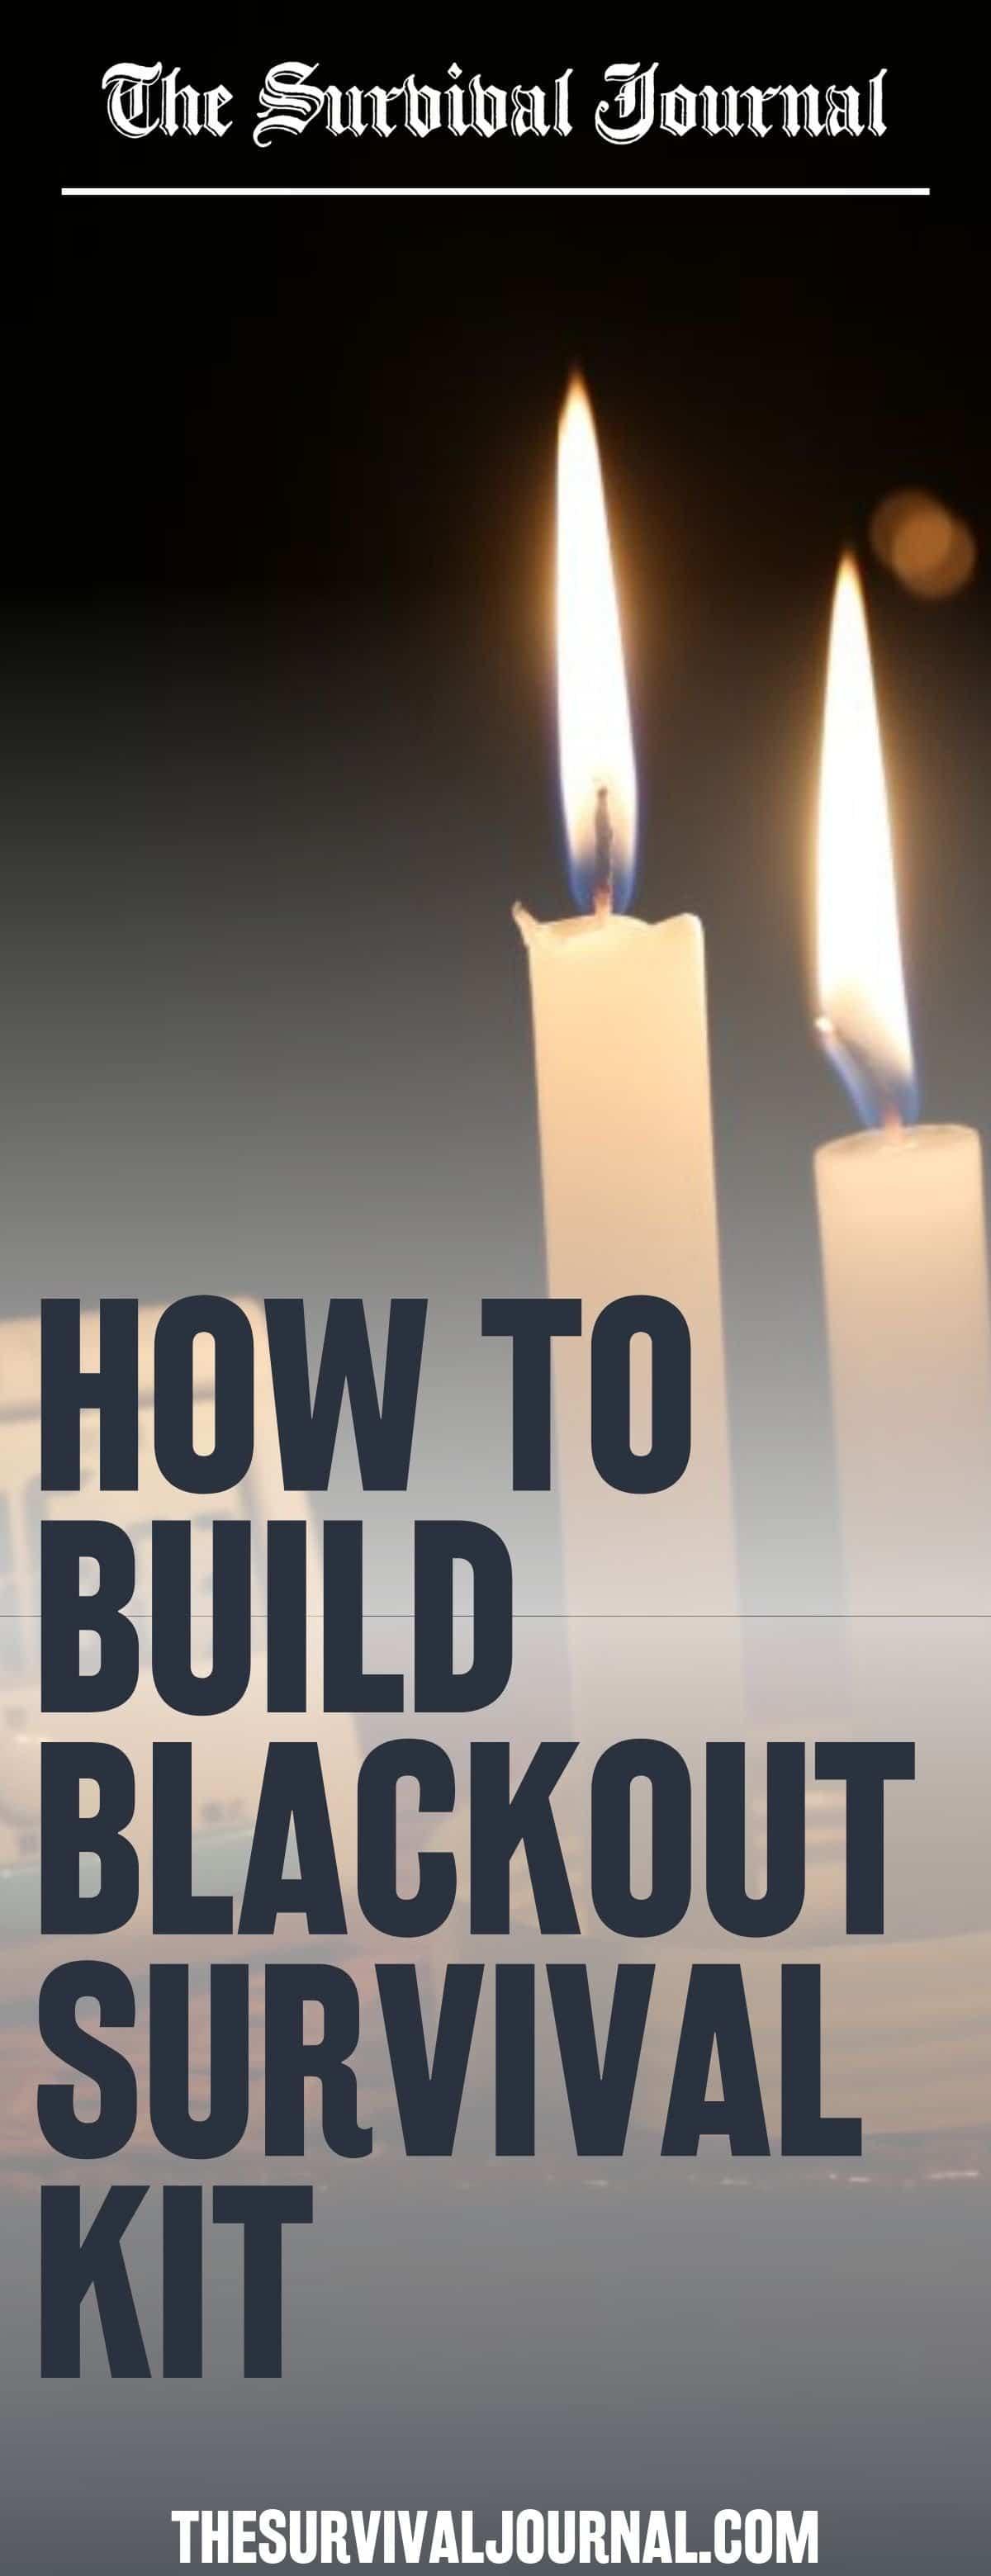 blackout survival kit